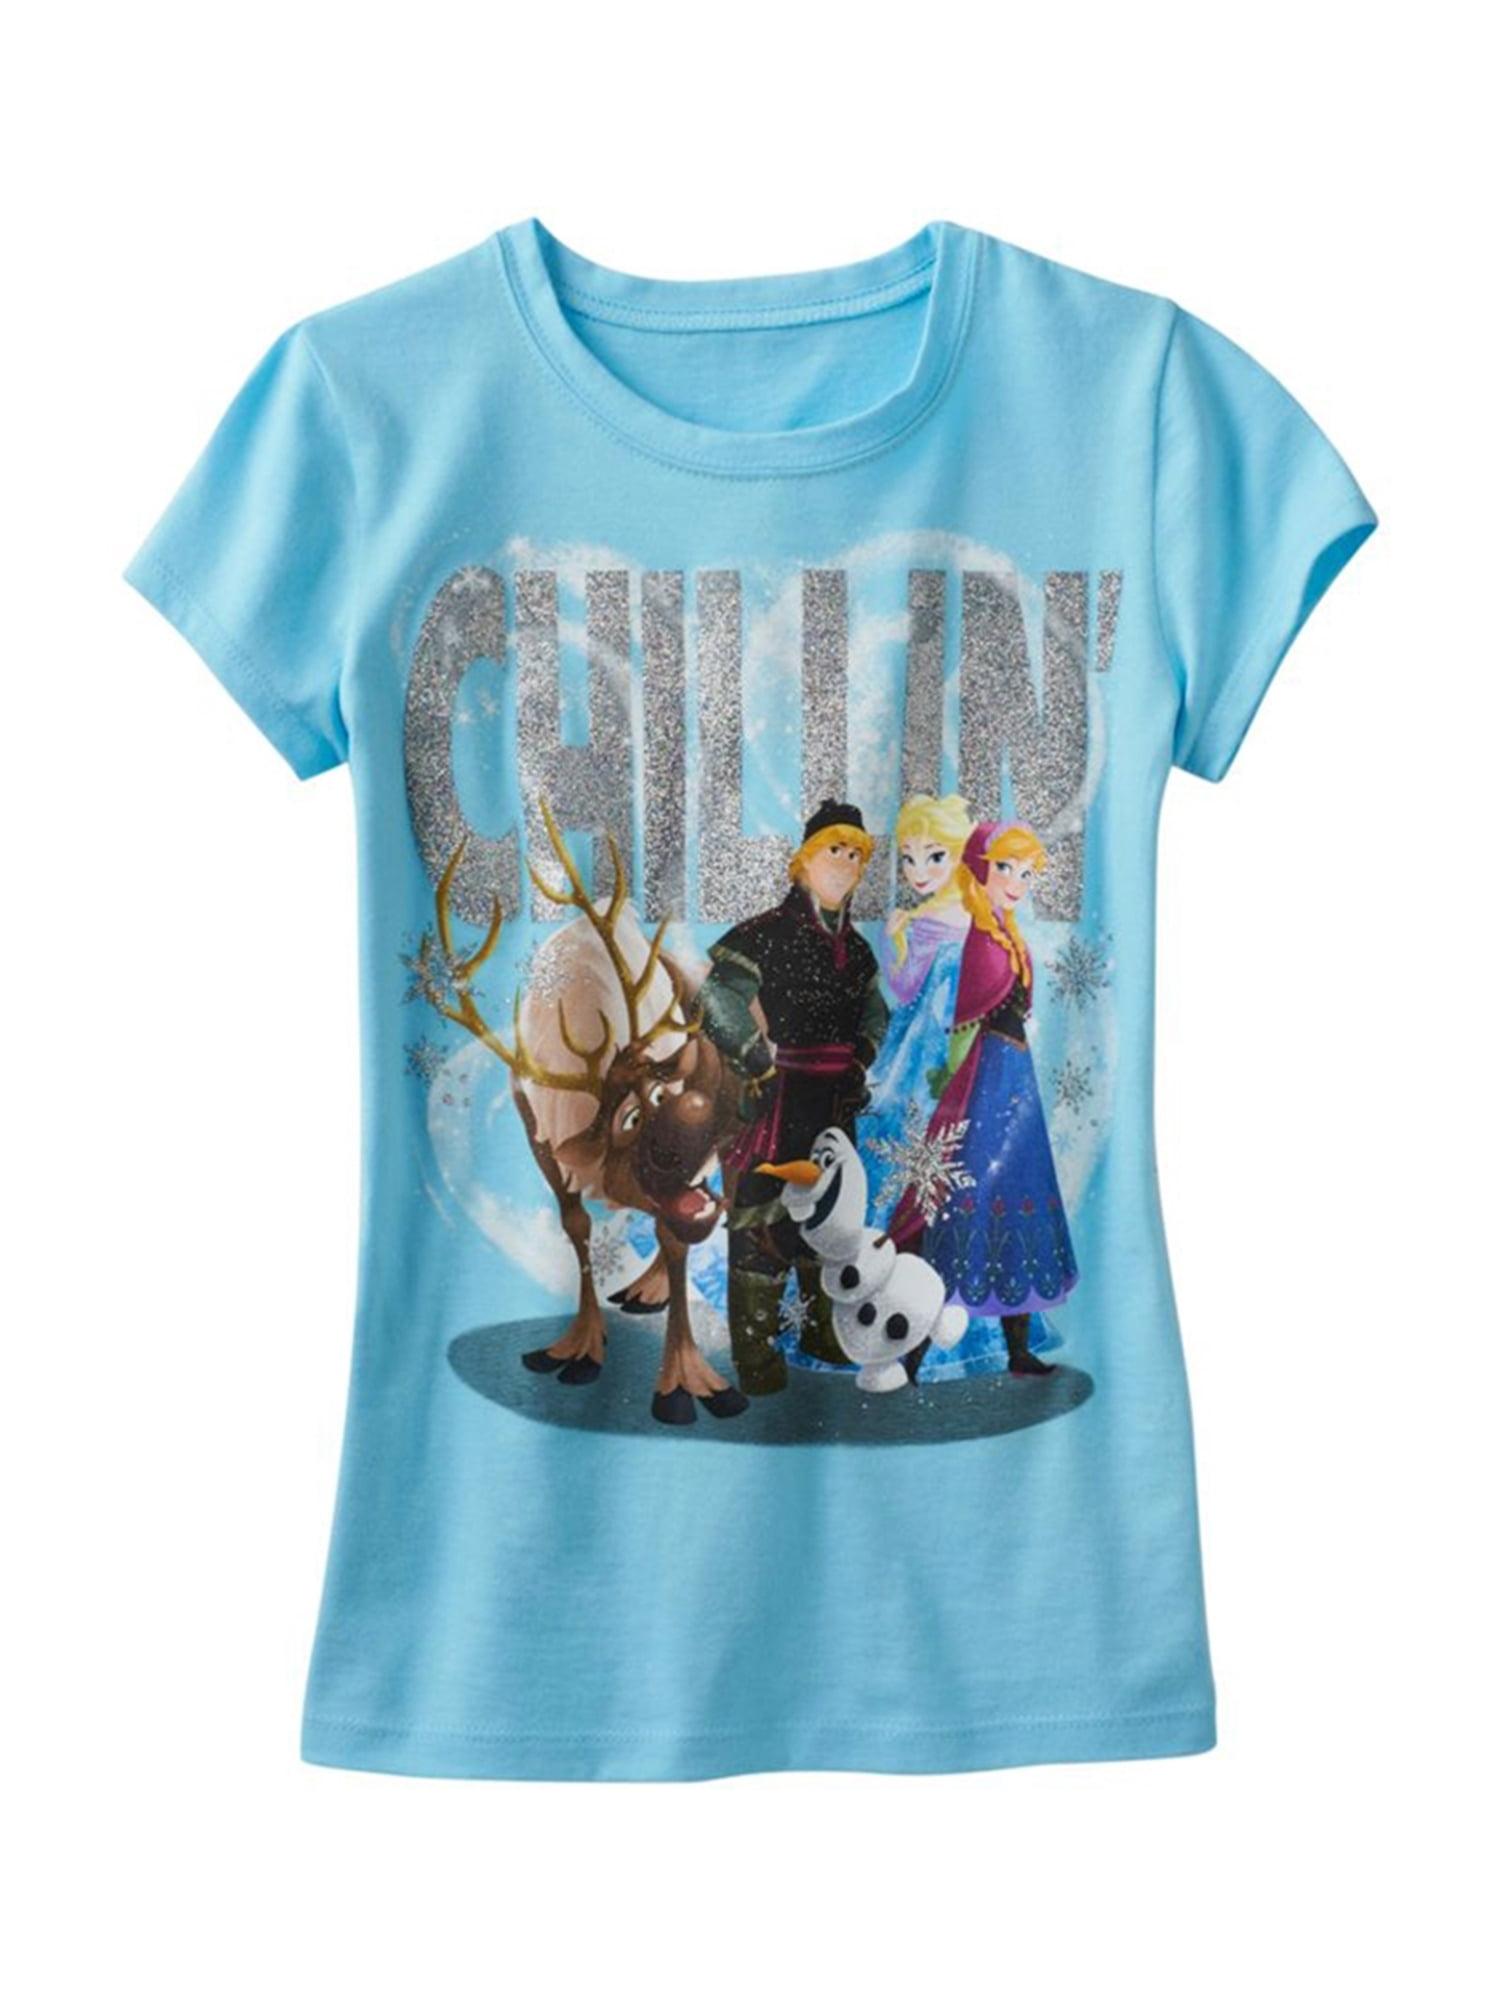 Disney Girls Chillin' Graphic T-Shirt